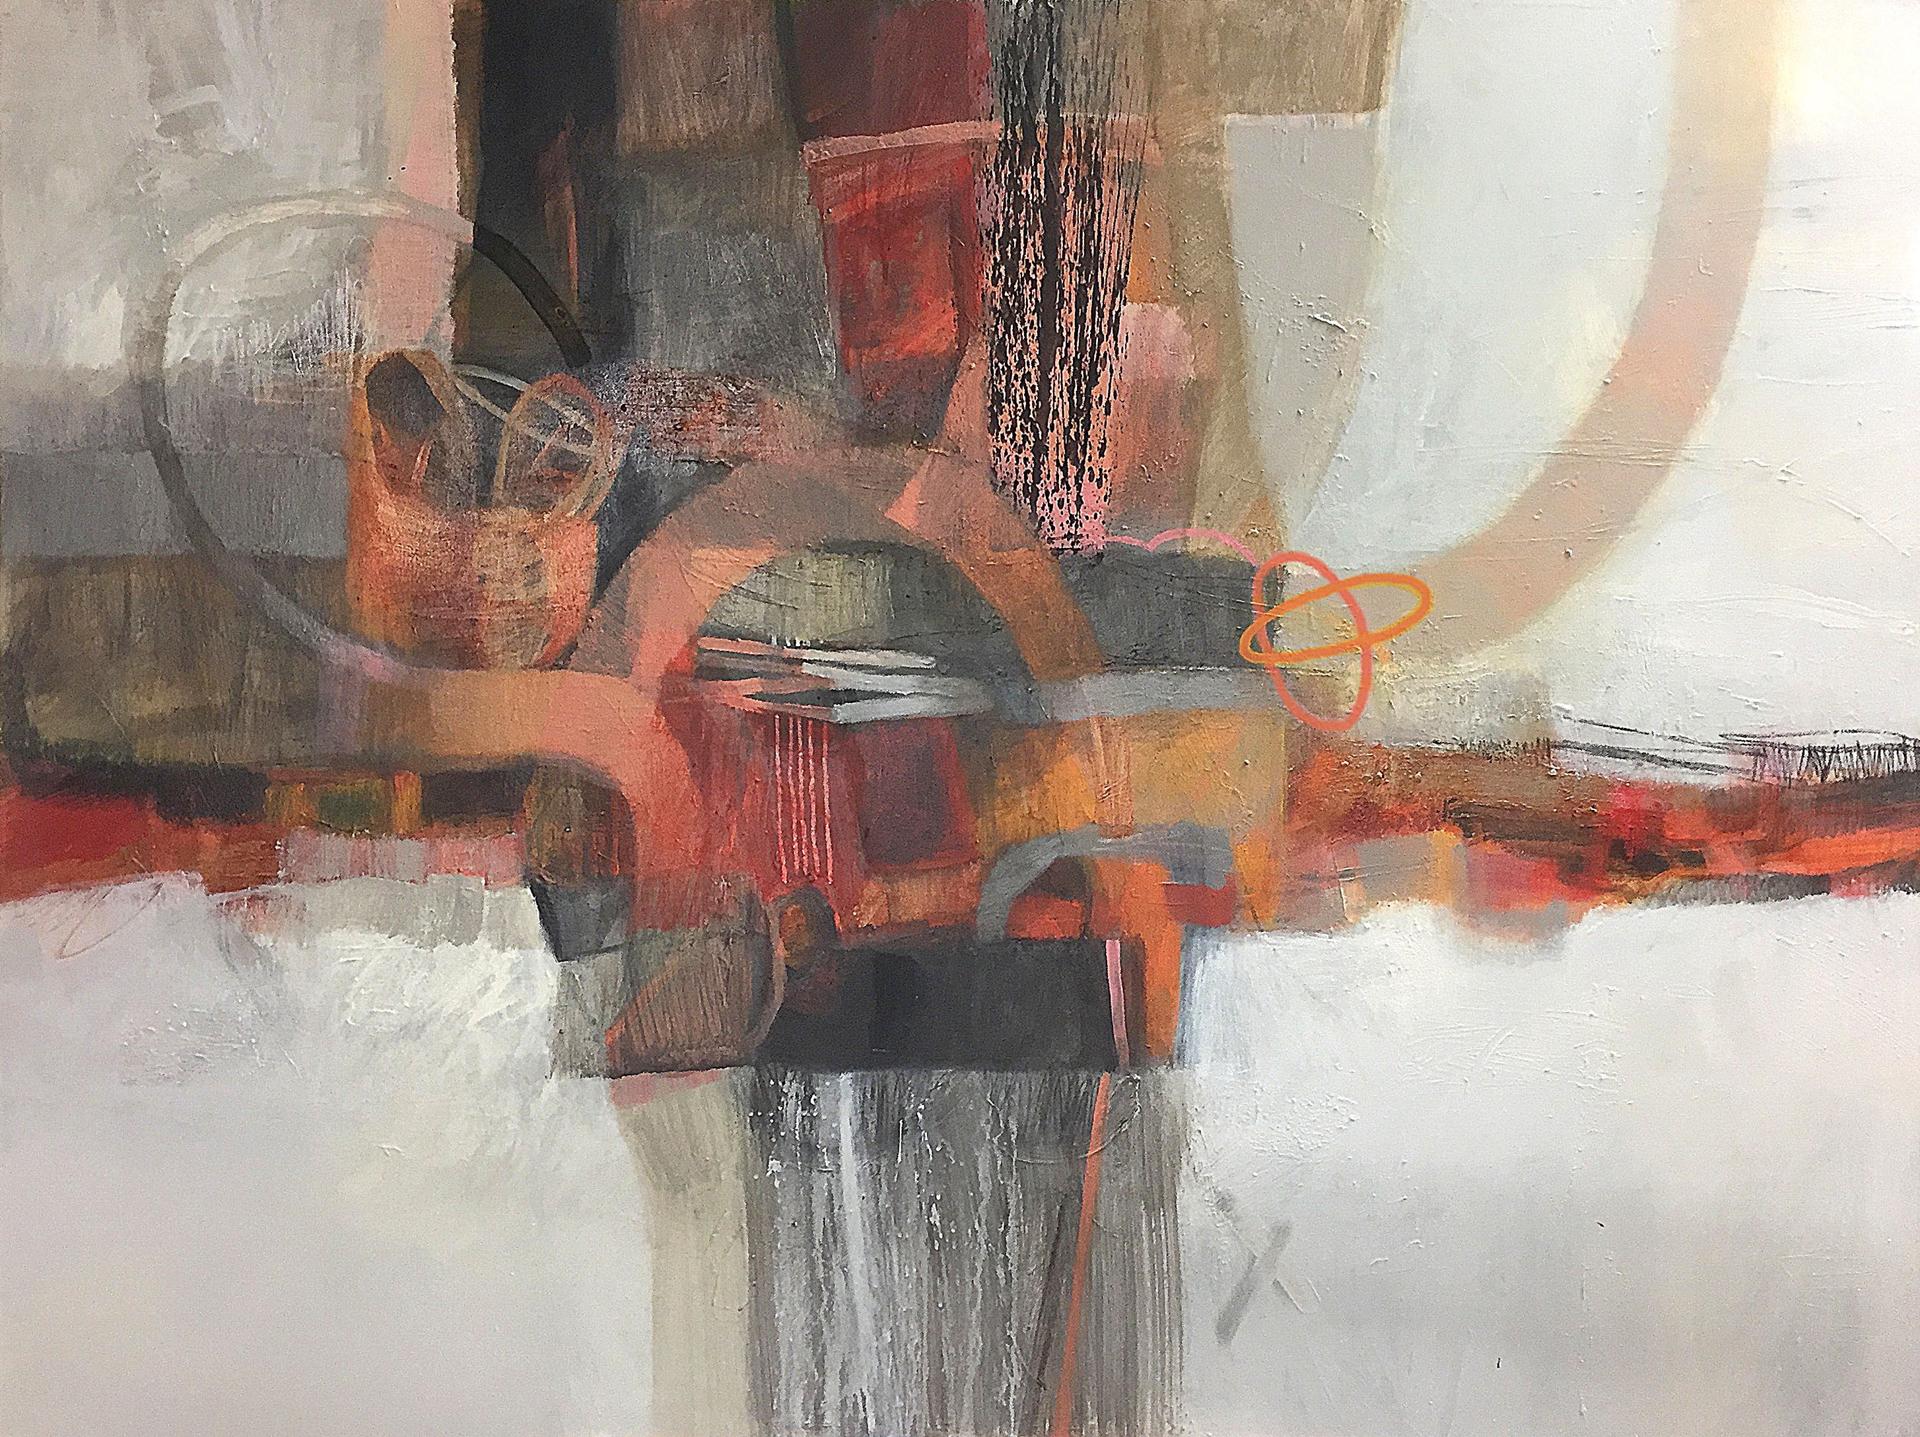 Untitled 197954 by Karen Roehl